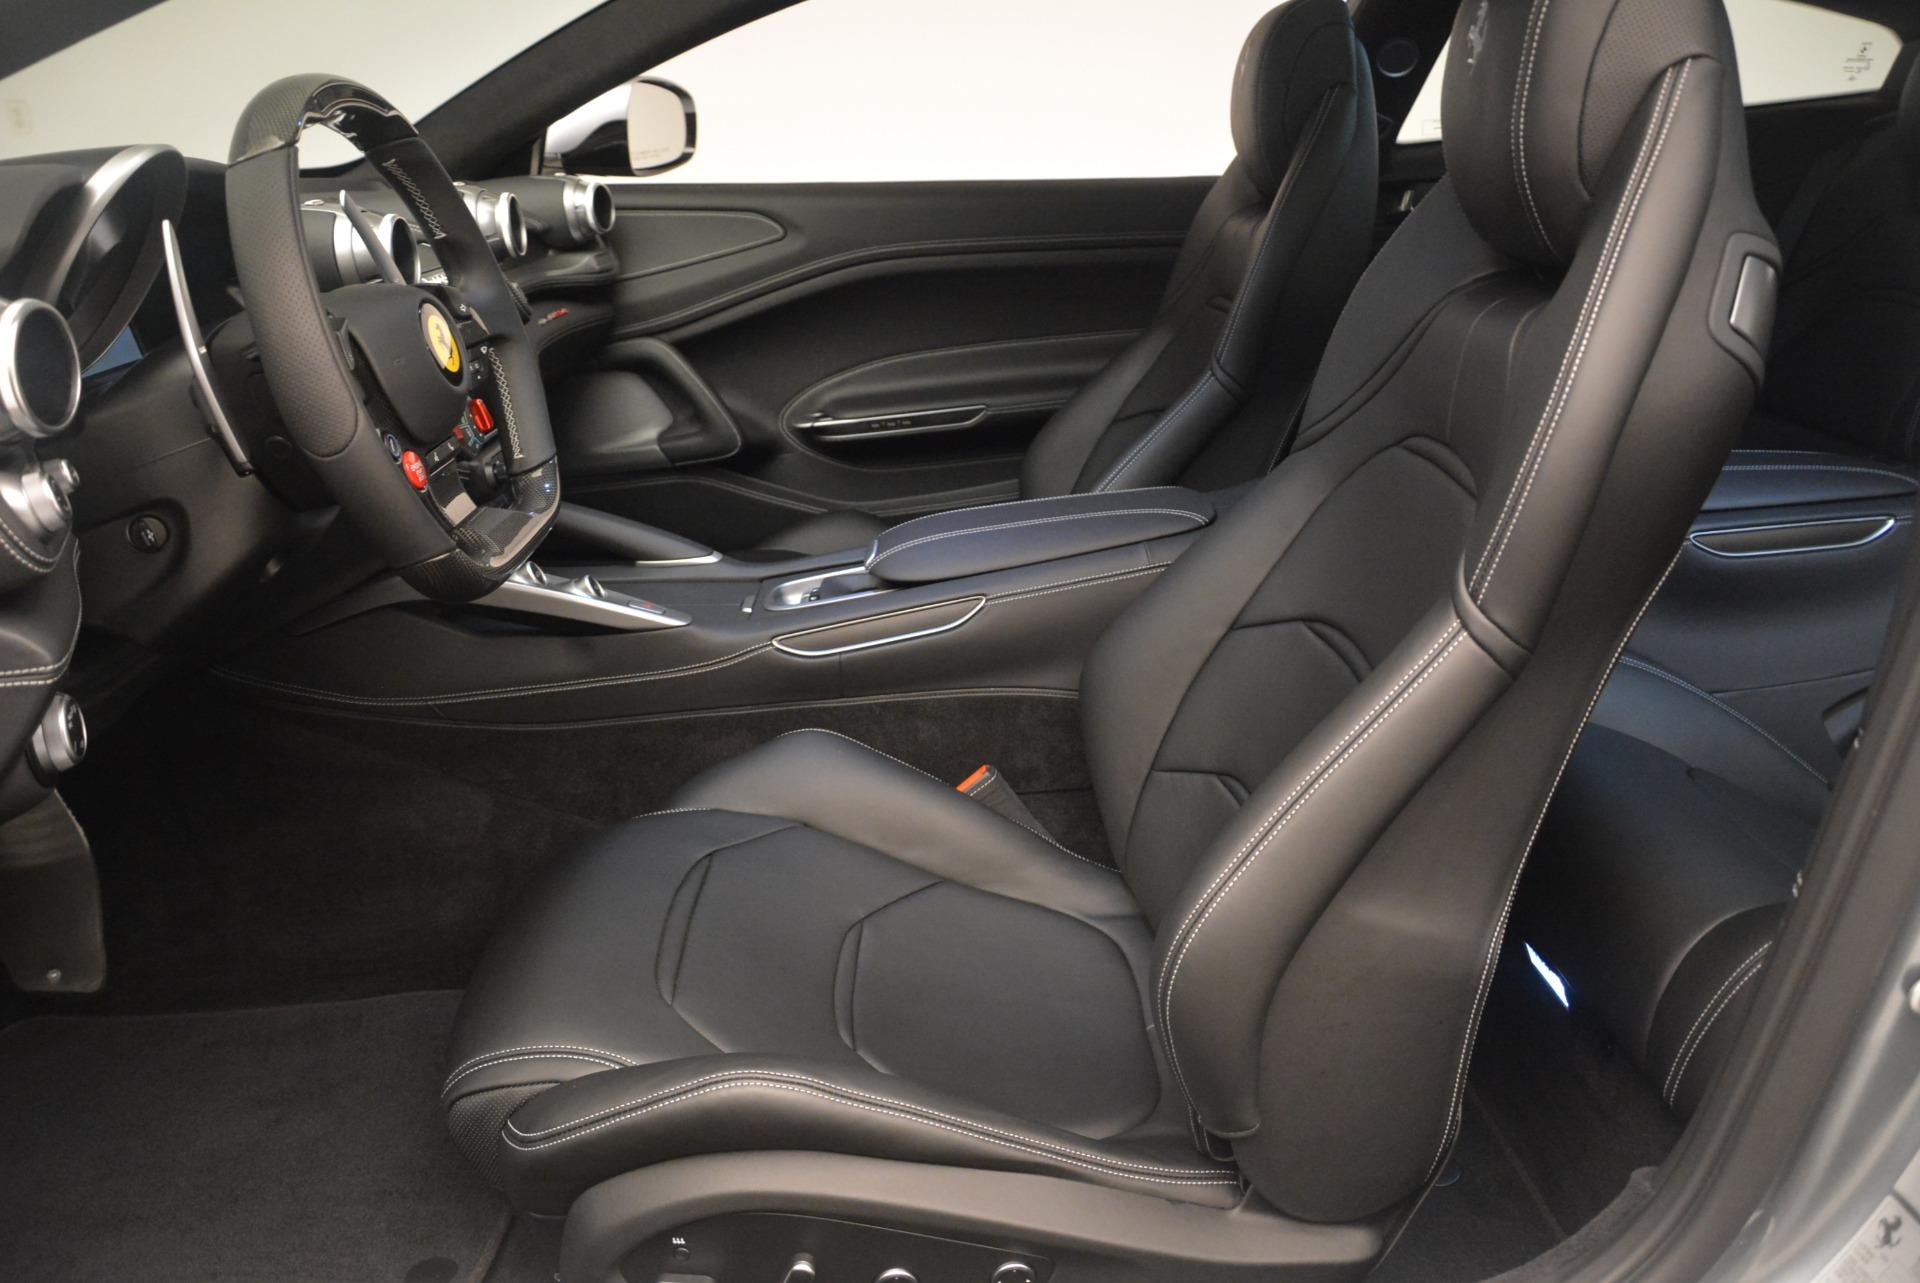 Used 2019 Ferrari GTC4LussoT V8 For Sale In Westport, CT 3447_p14